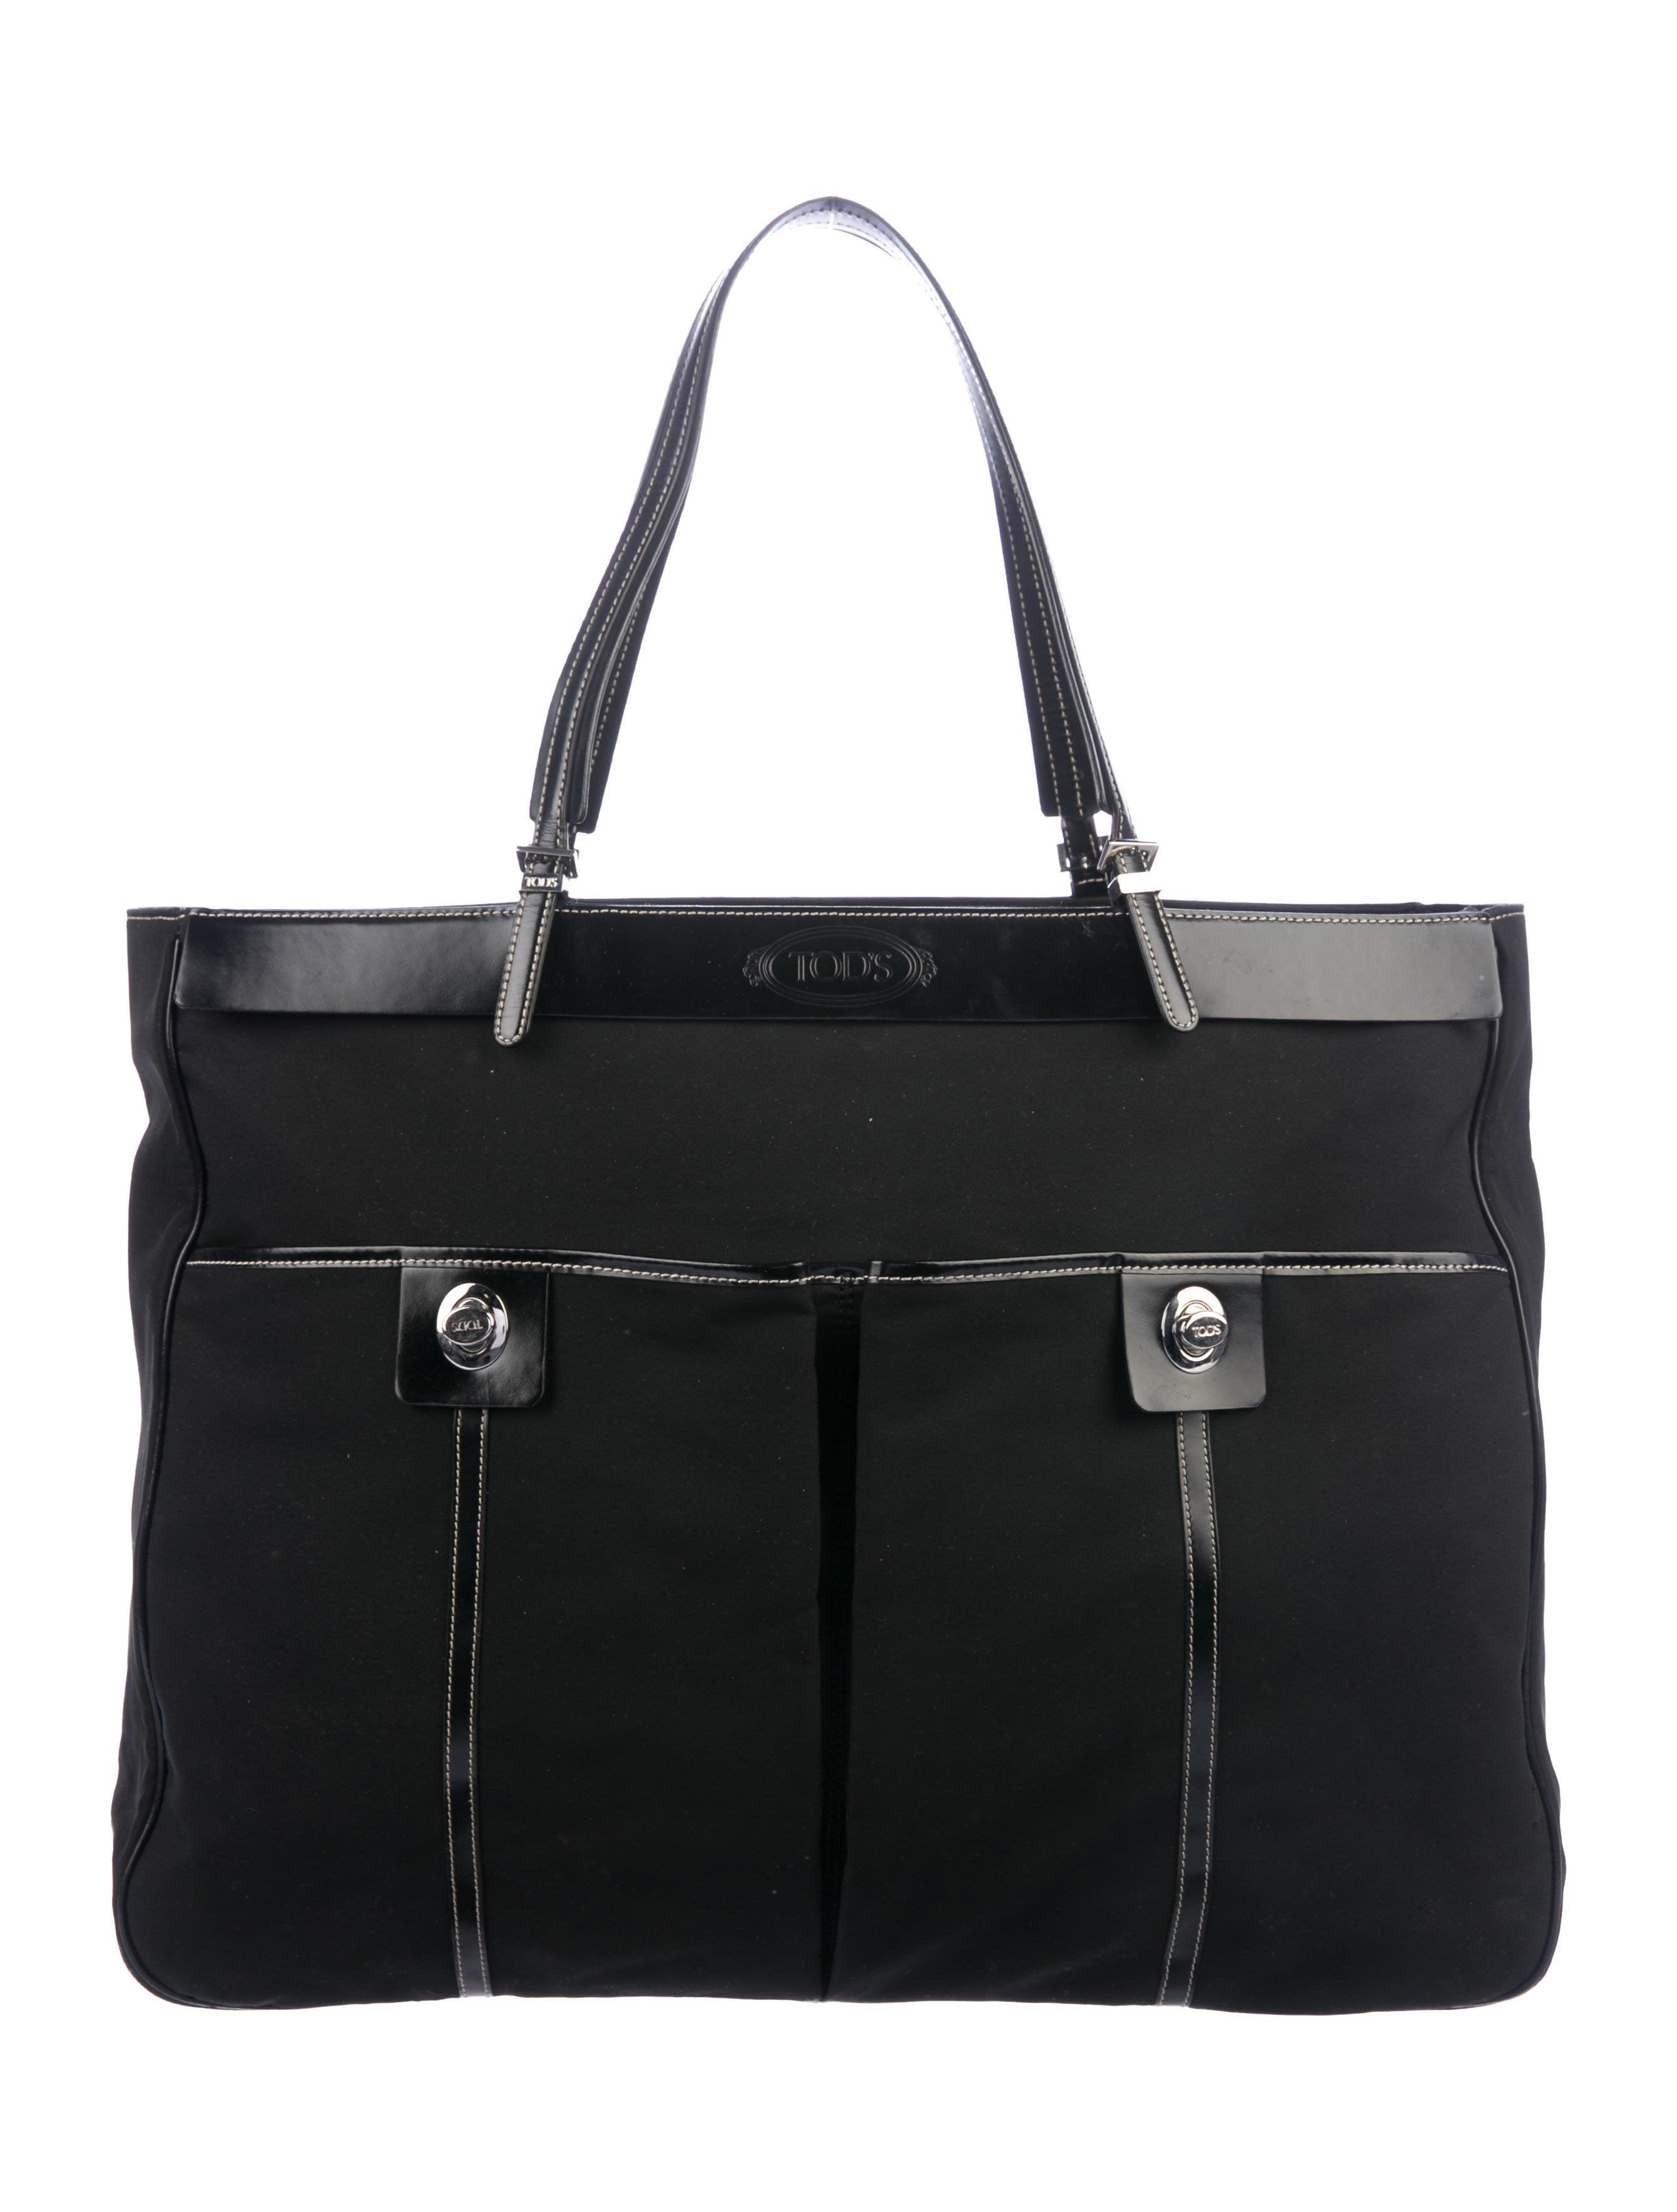 2096fcc4edd0 Handbags